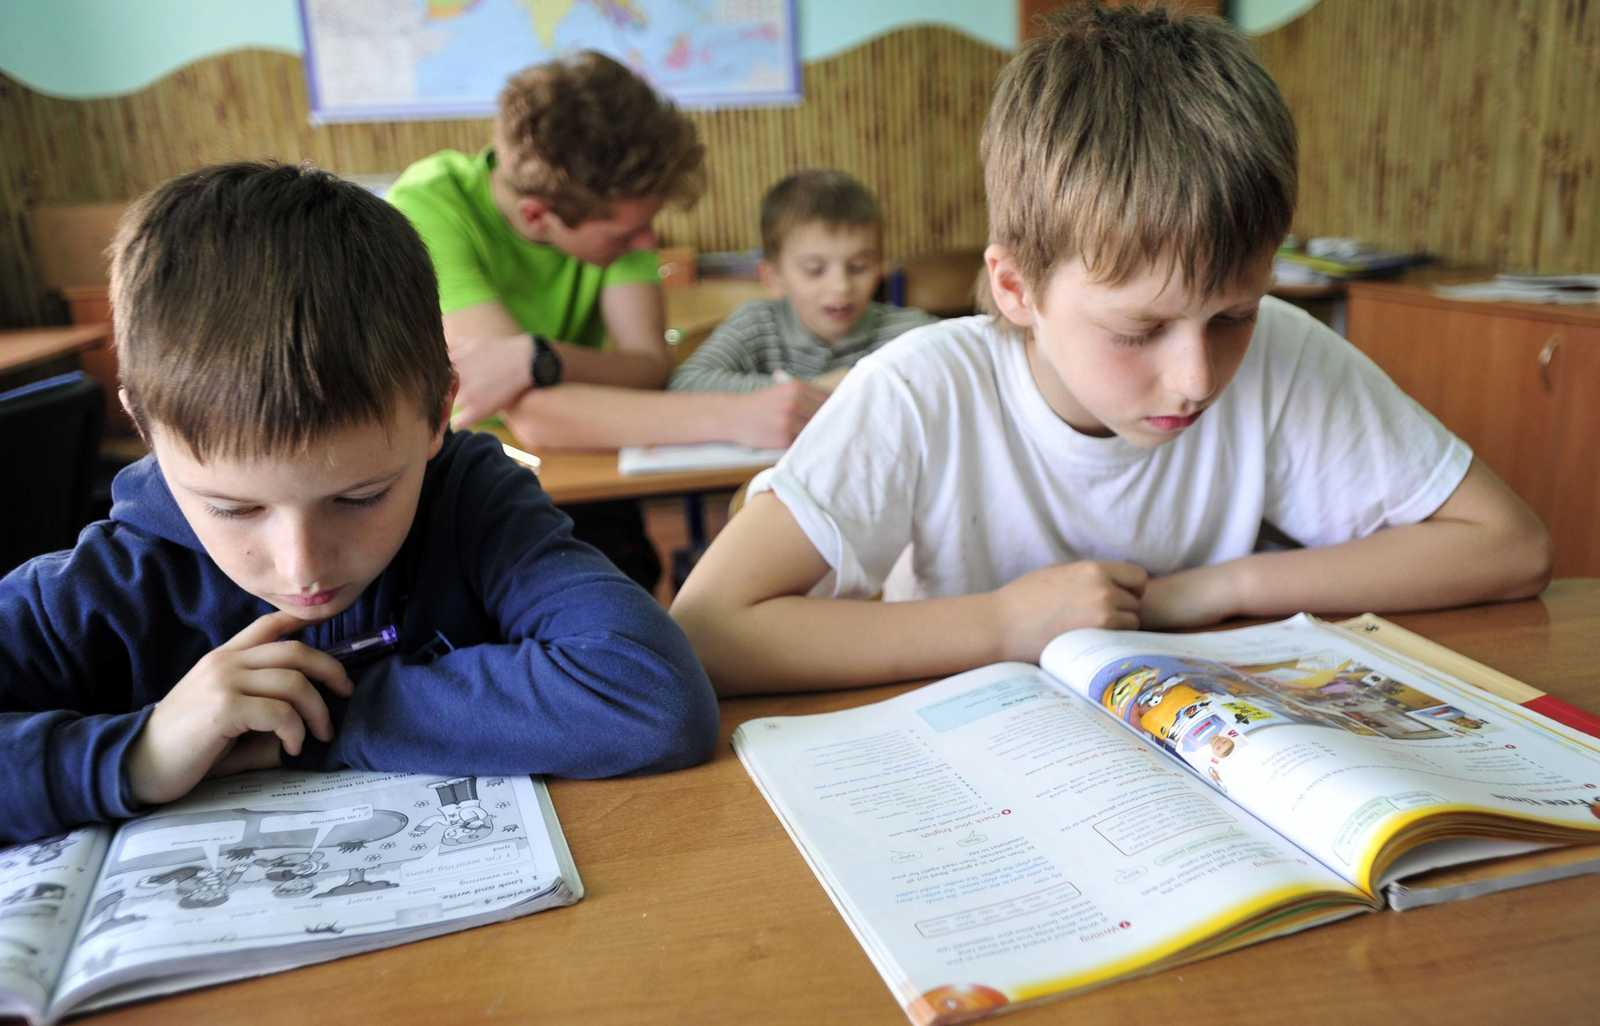 Schüler lesen in Unterrichtsmaterial